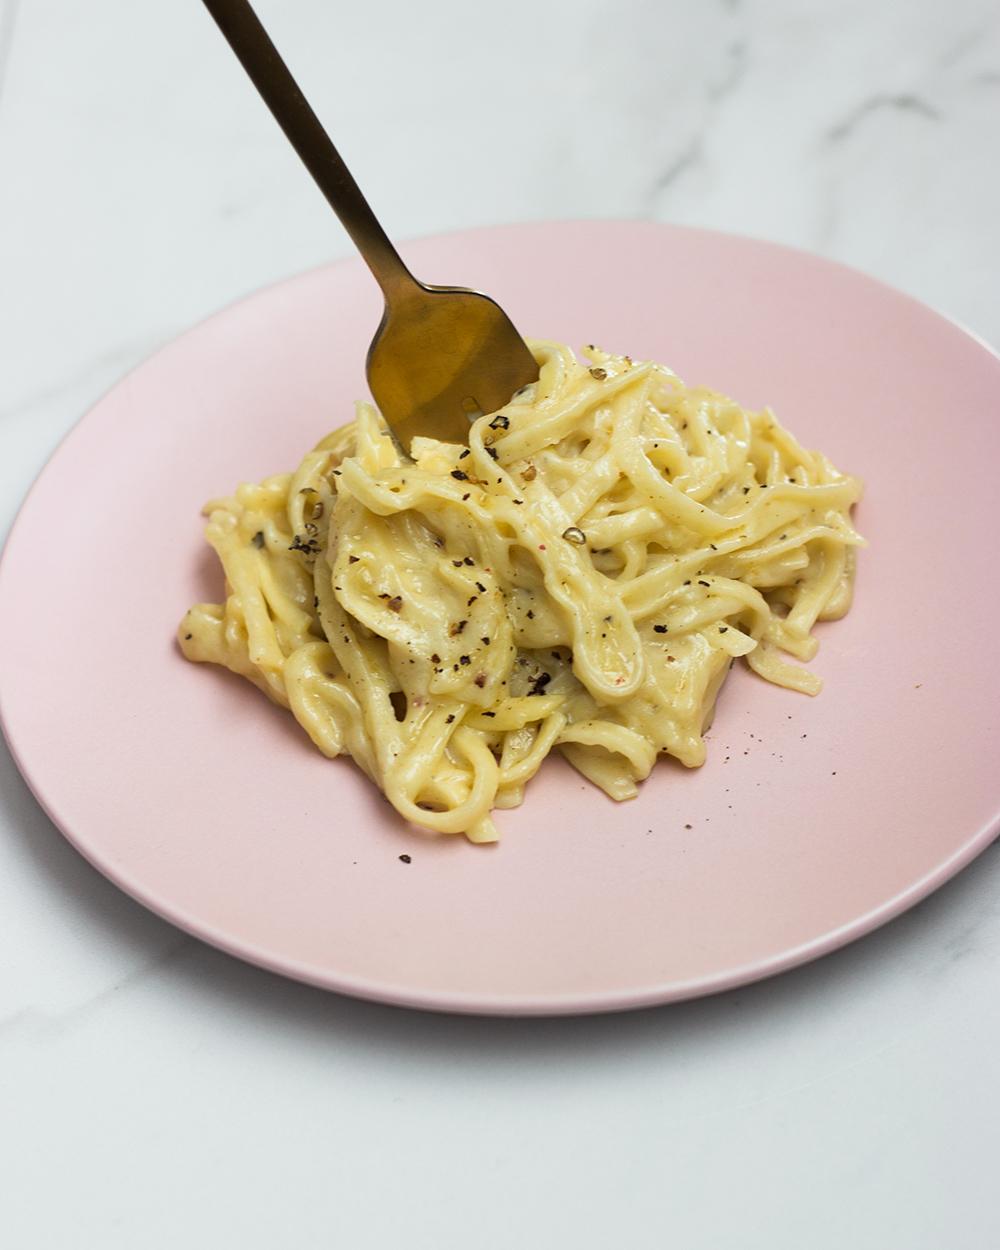 livvyland-blog-olivia-watson-austin-texas-lifestyle-blogger-summer-cacio-e-pepe-pasta-recipe-jessica-lee-1